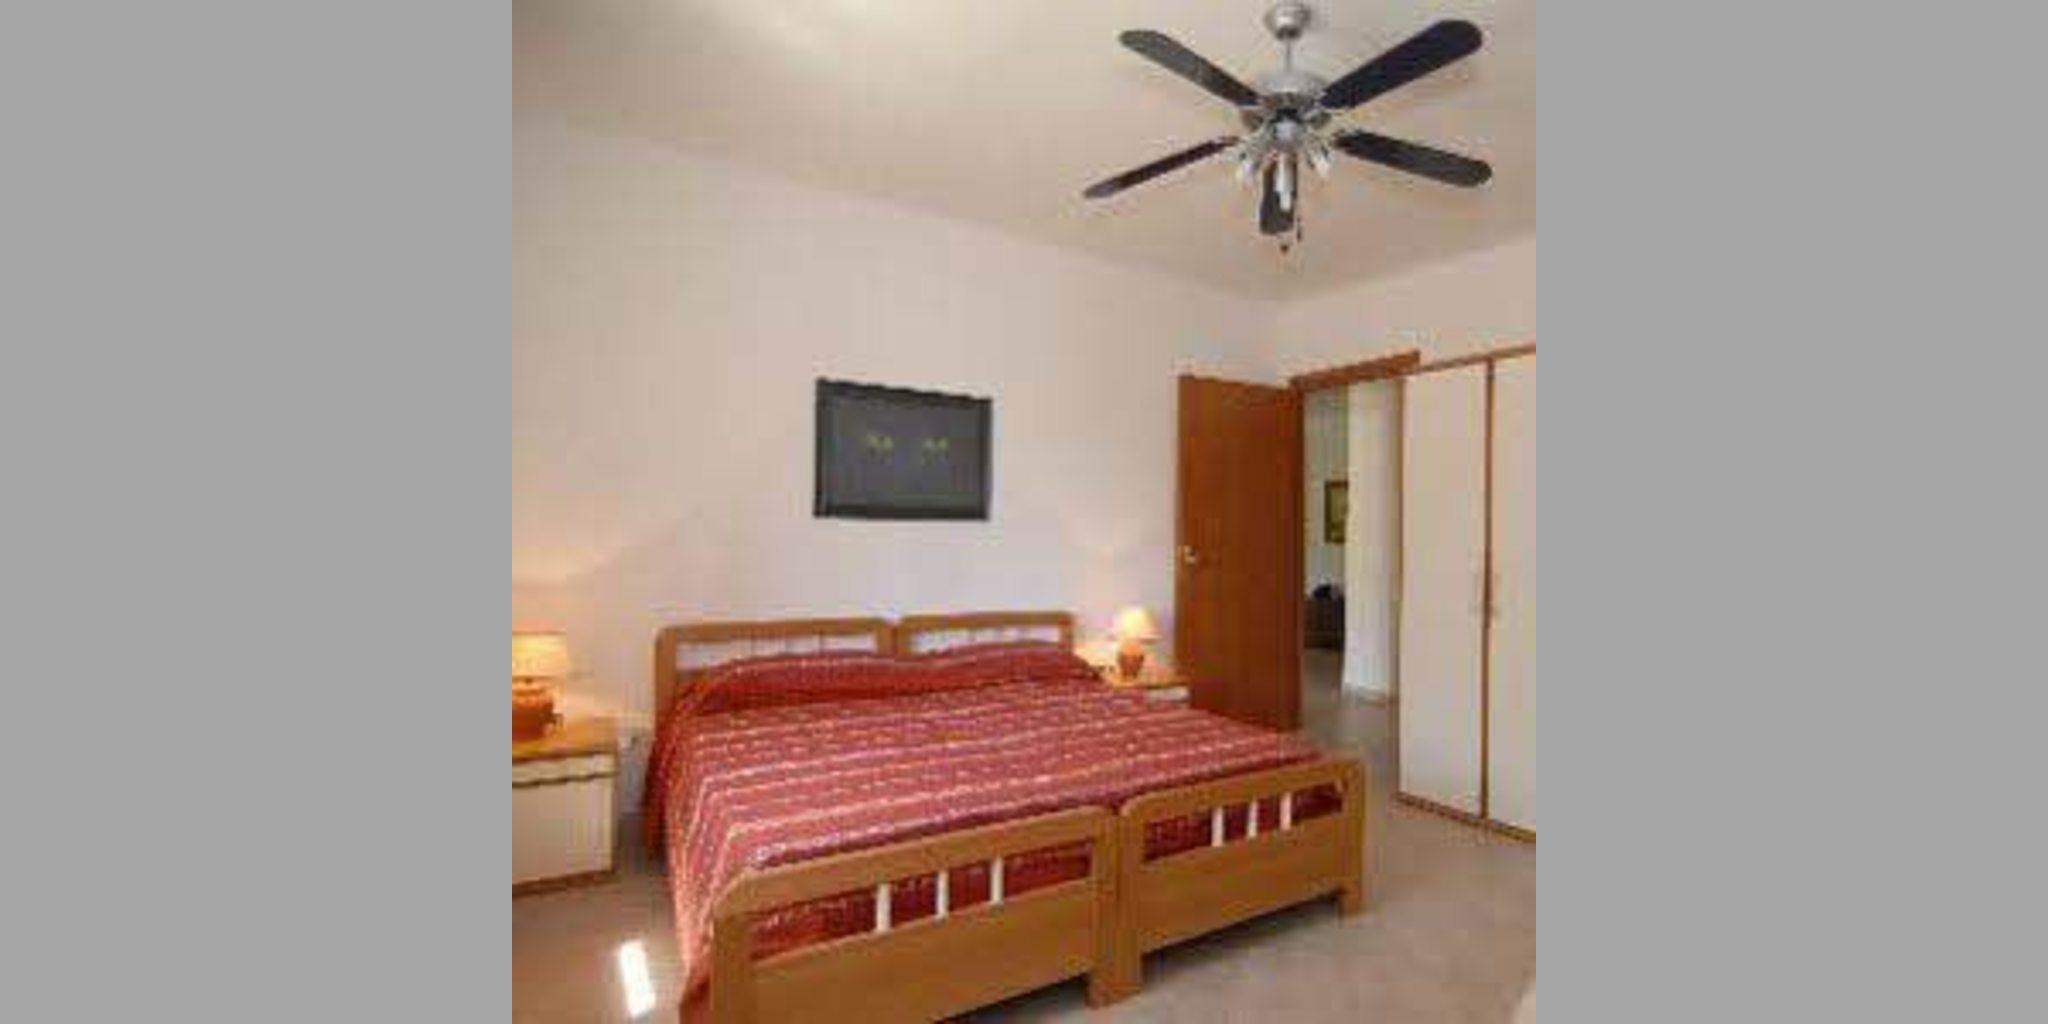 Bed & Breakfast Guidonia Montecelio - Parco Azzurro